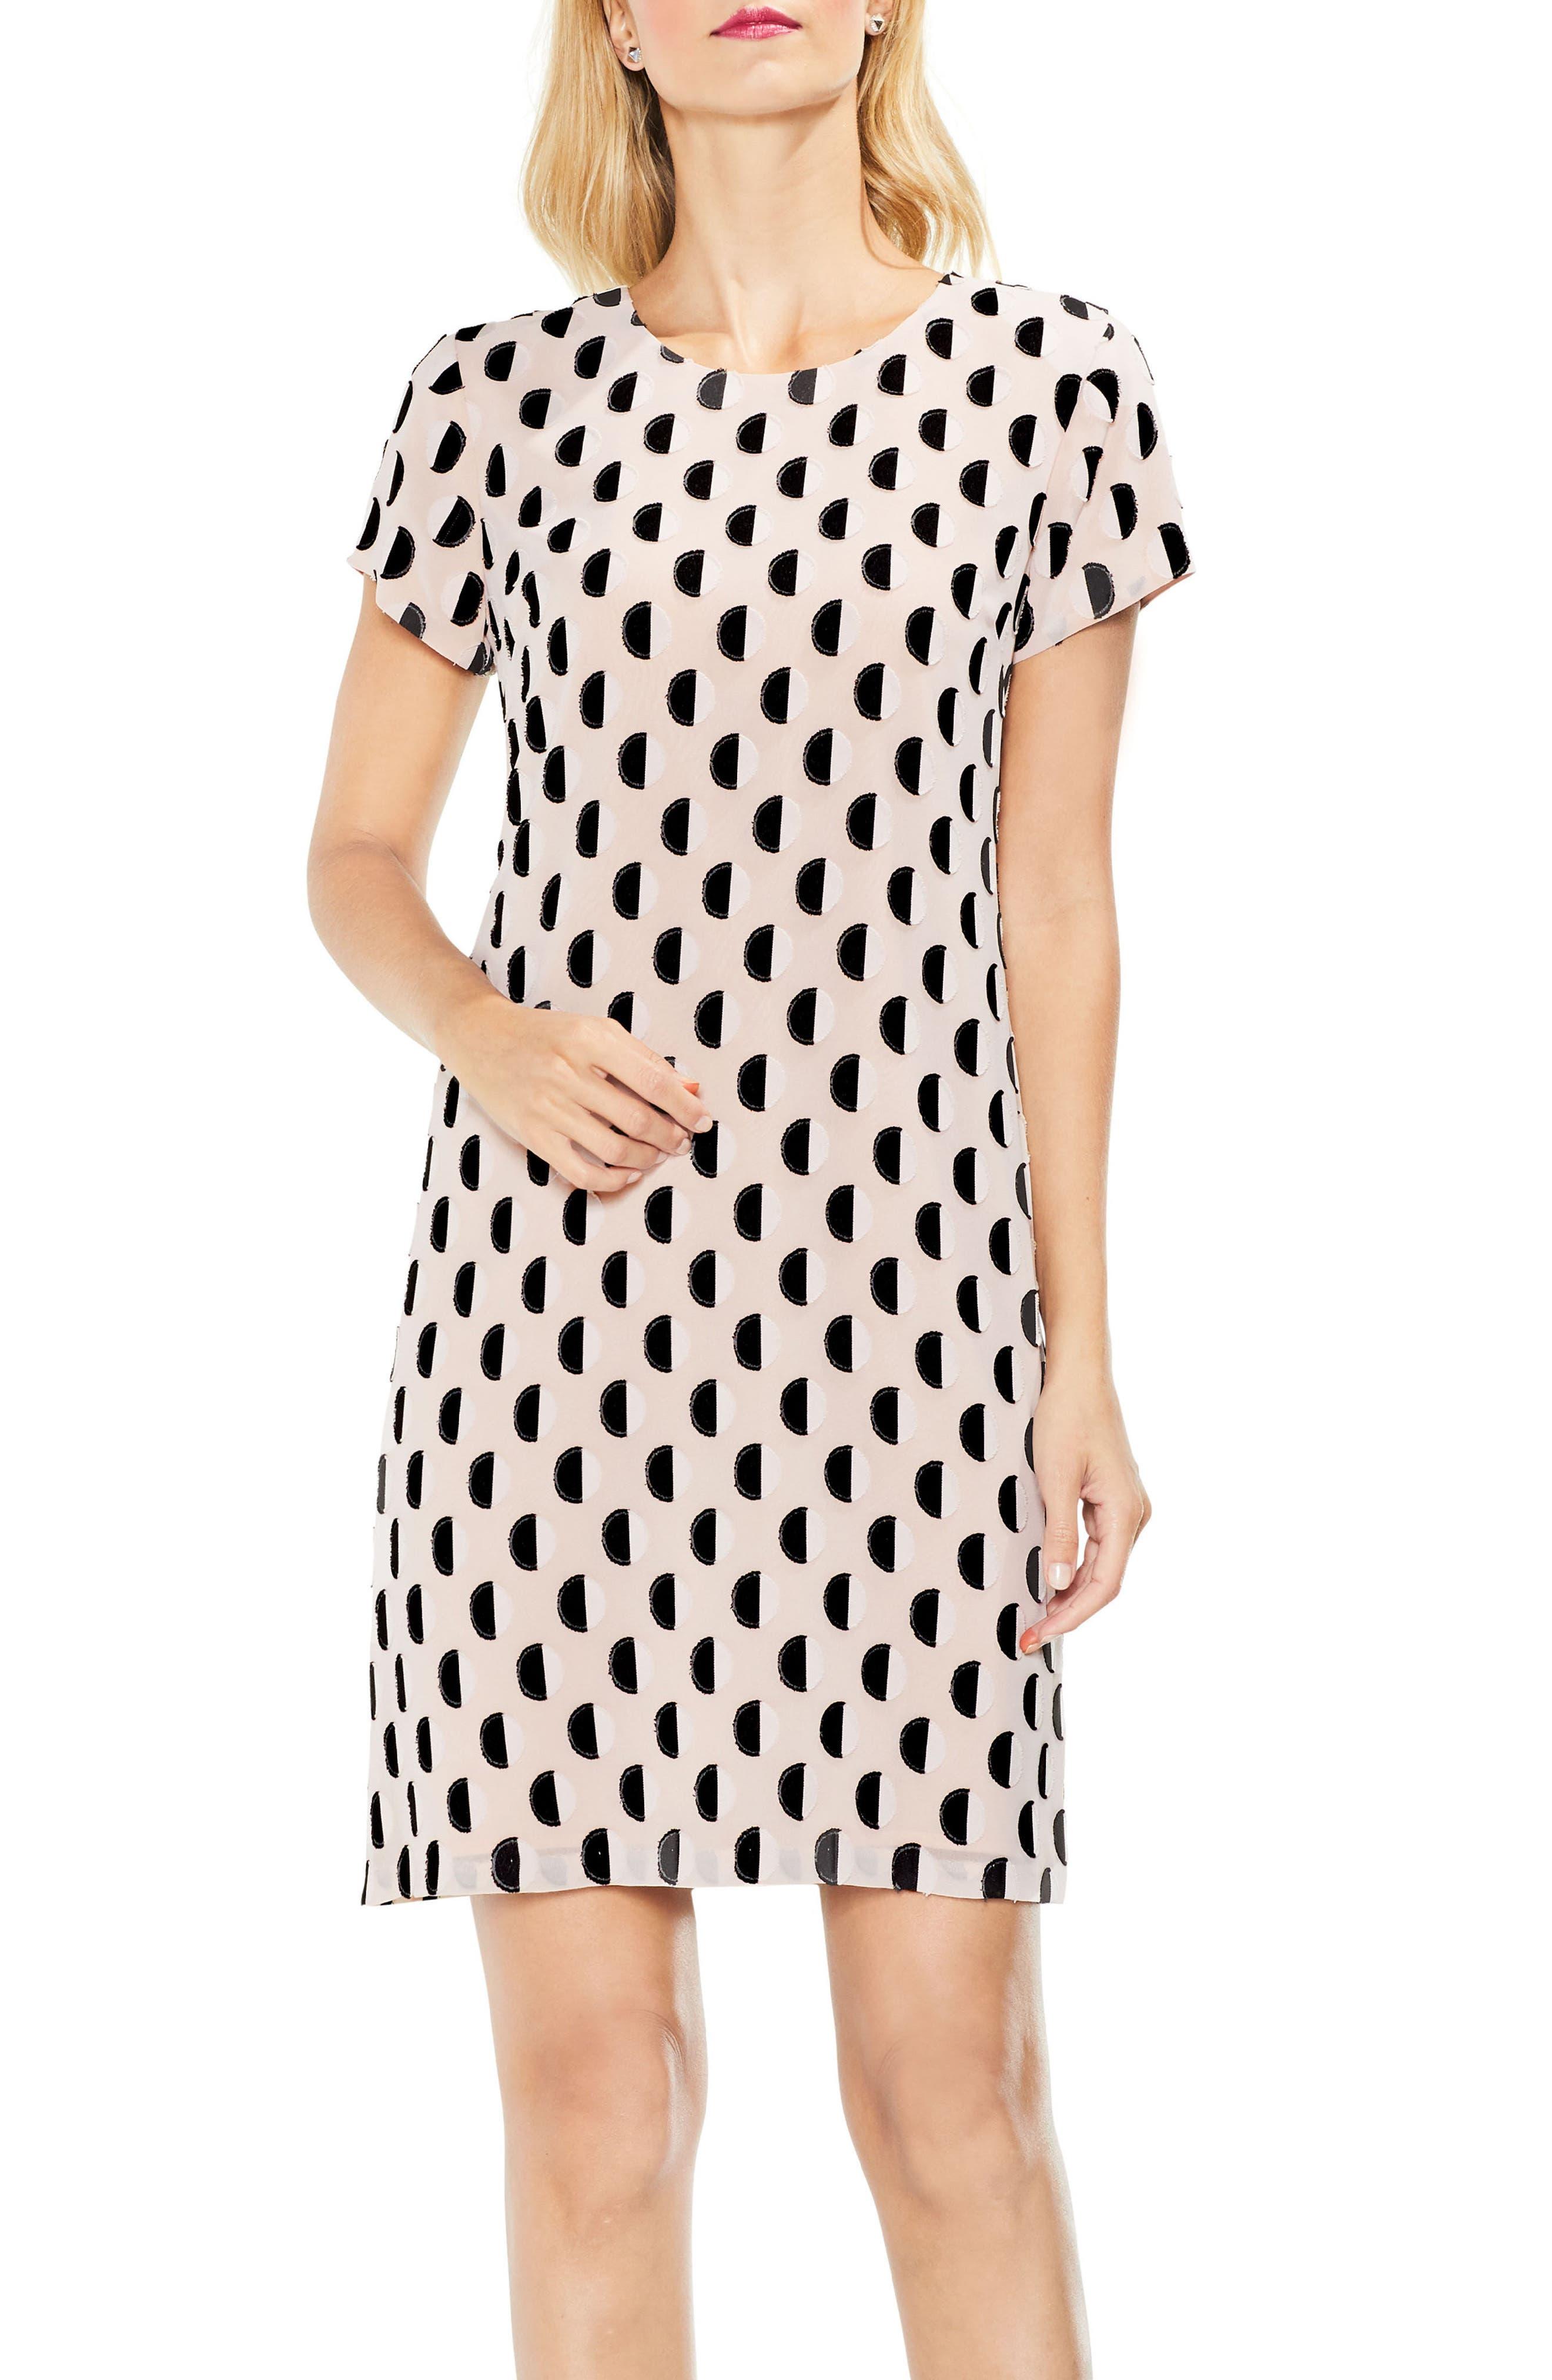 Main Image - Vince Camuto Graphic Clip Dot Shift Dress